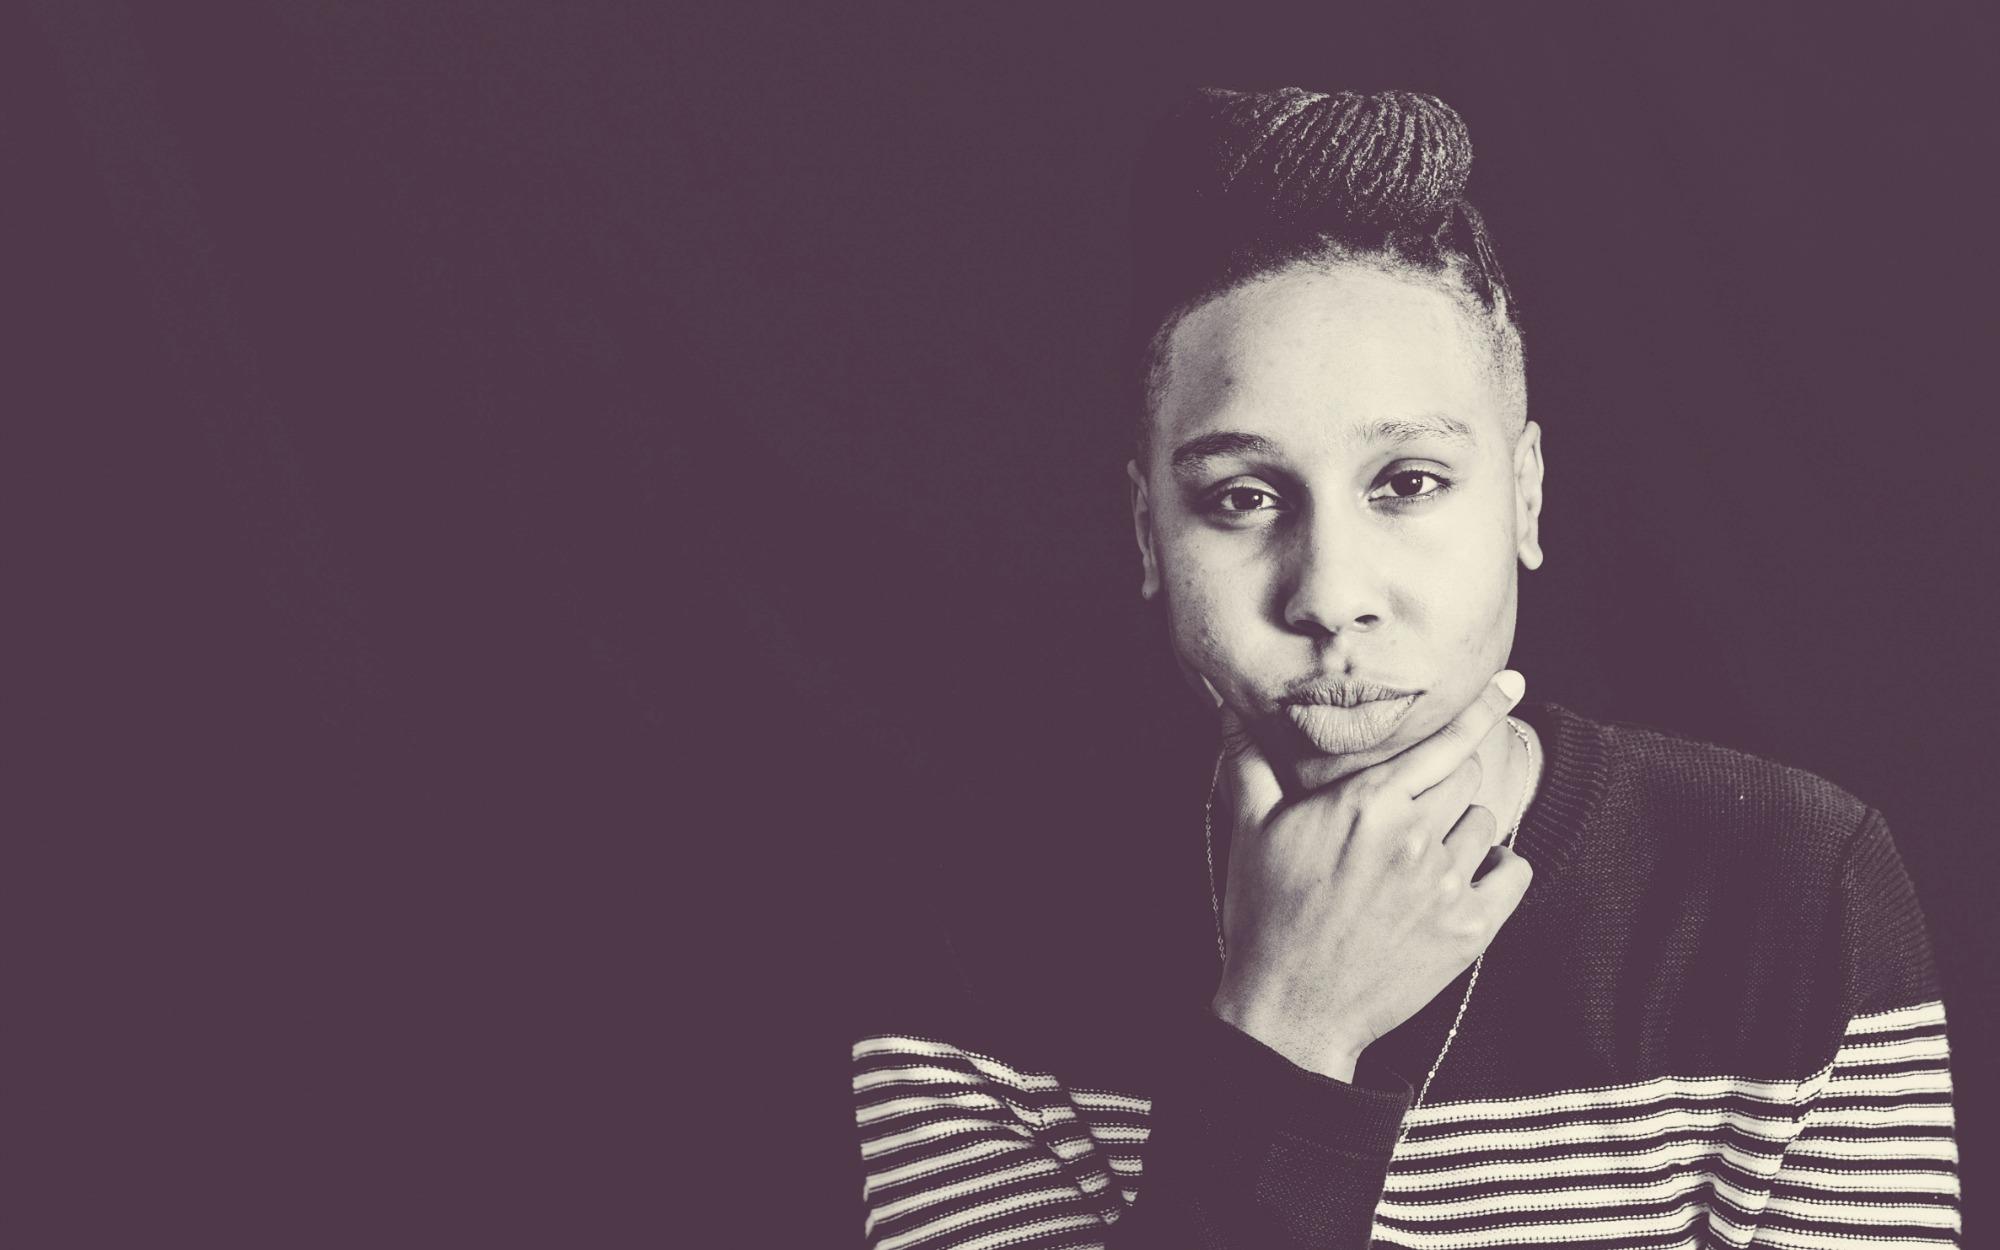 Lena Waithe, African American Actress, African American News, LGBTQ, KOLUMN Magazine, KOLUMN